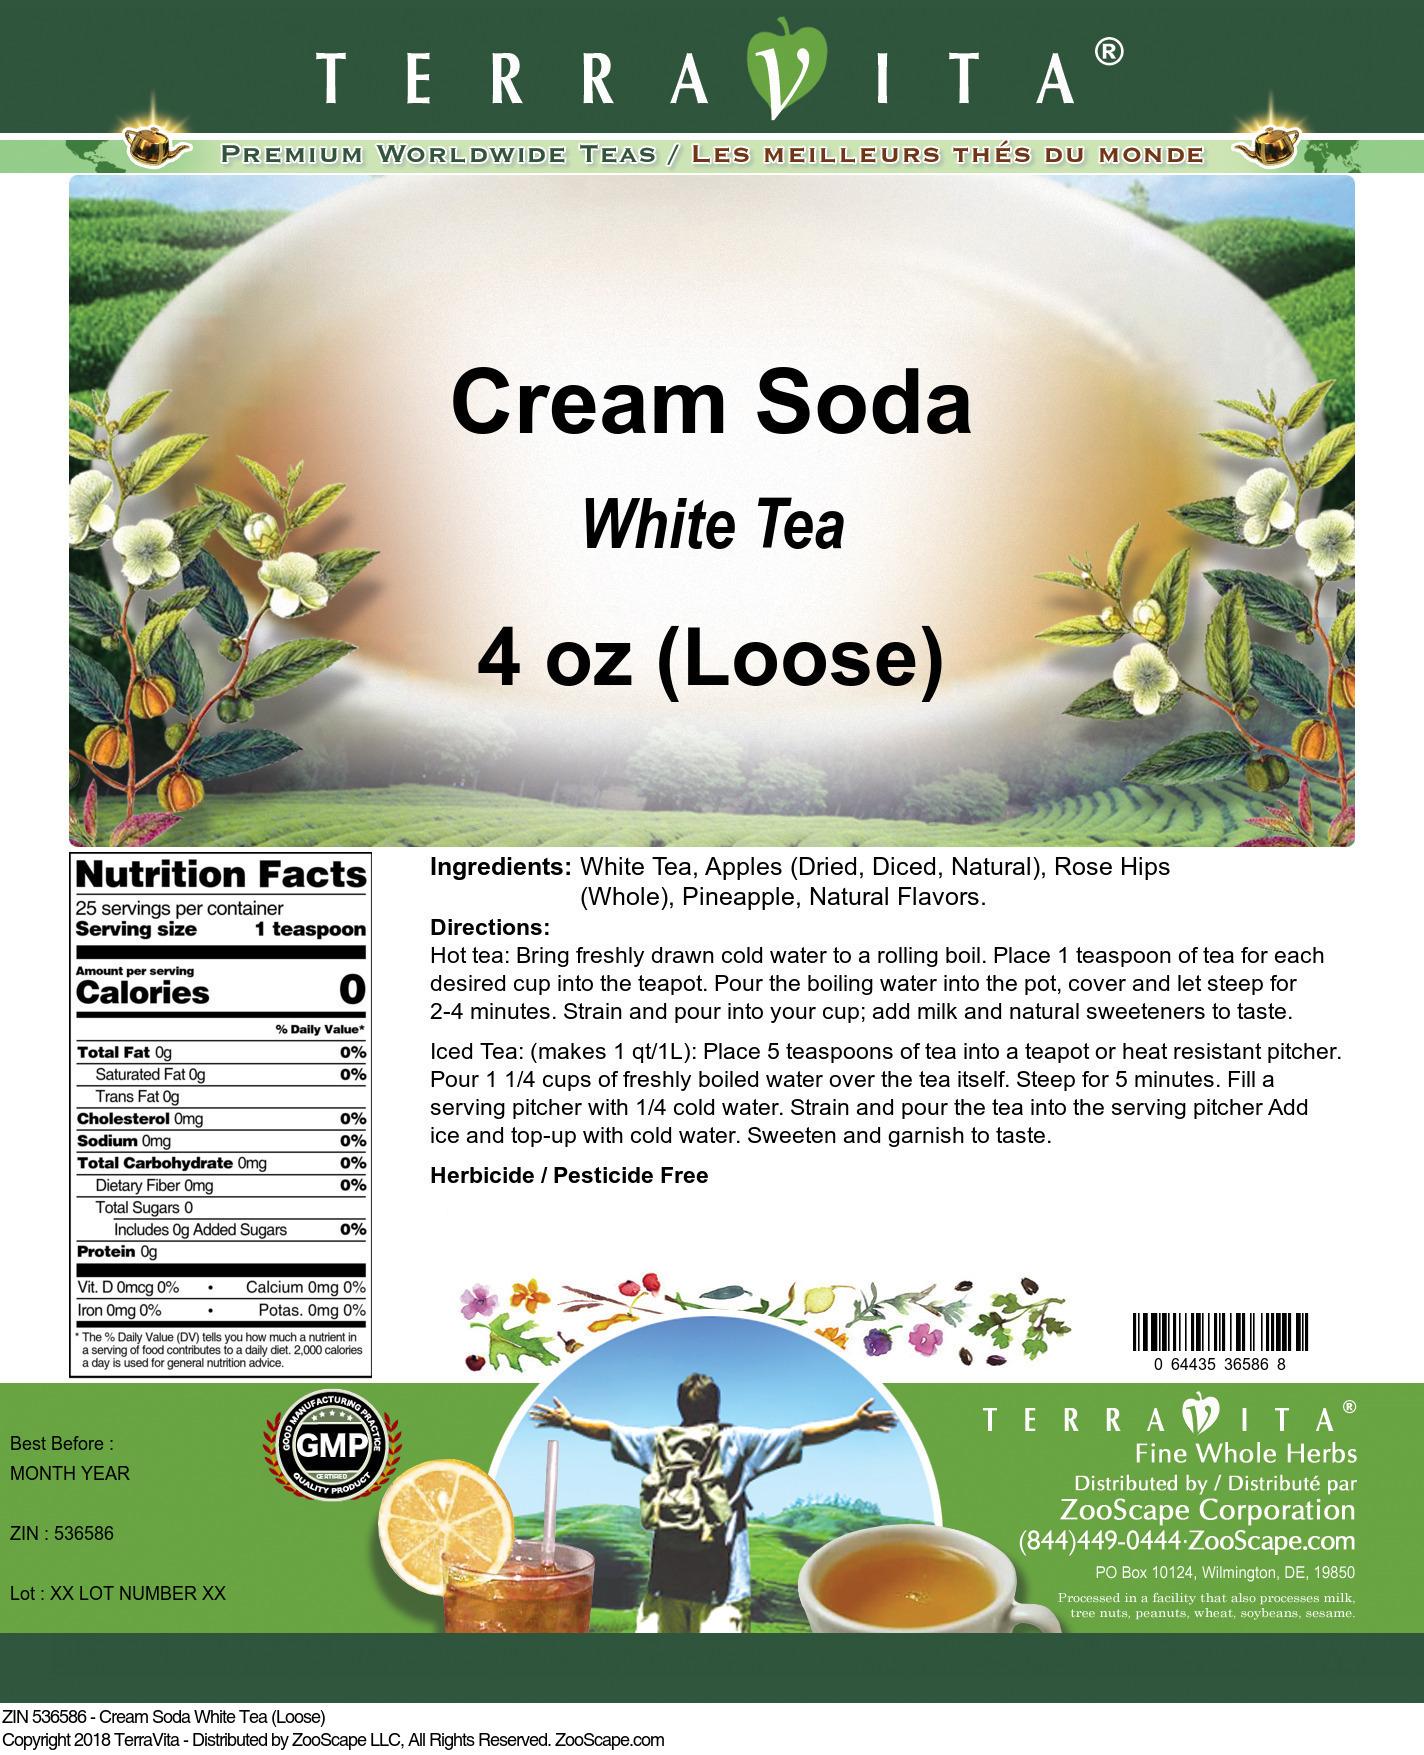 Cream Soda White Tea (Loose)